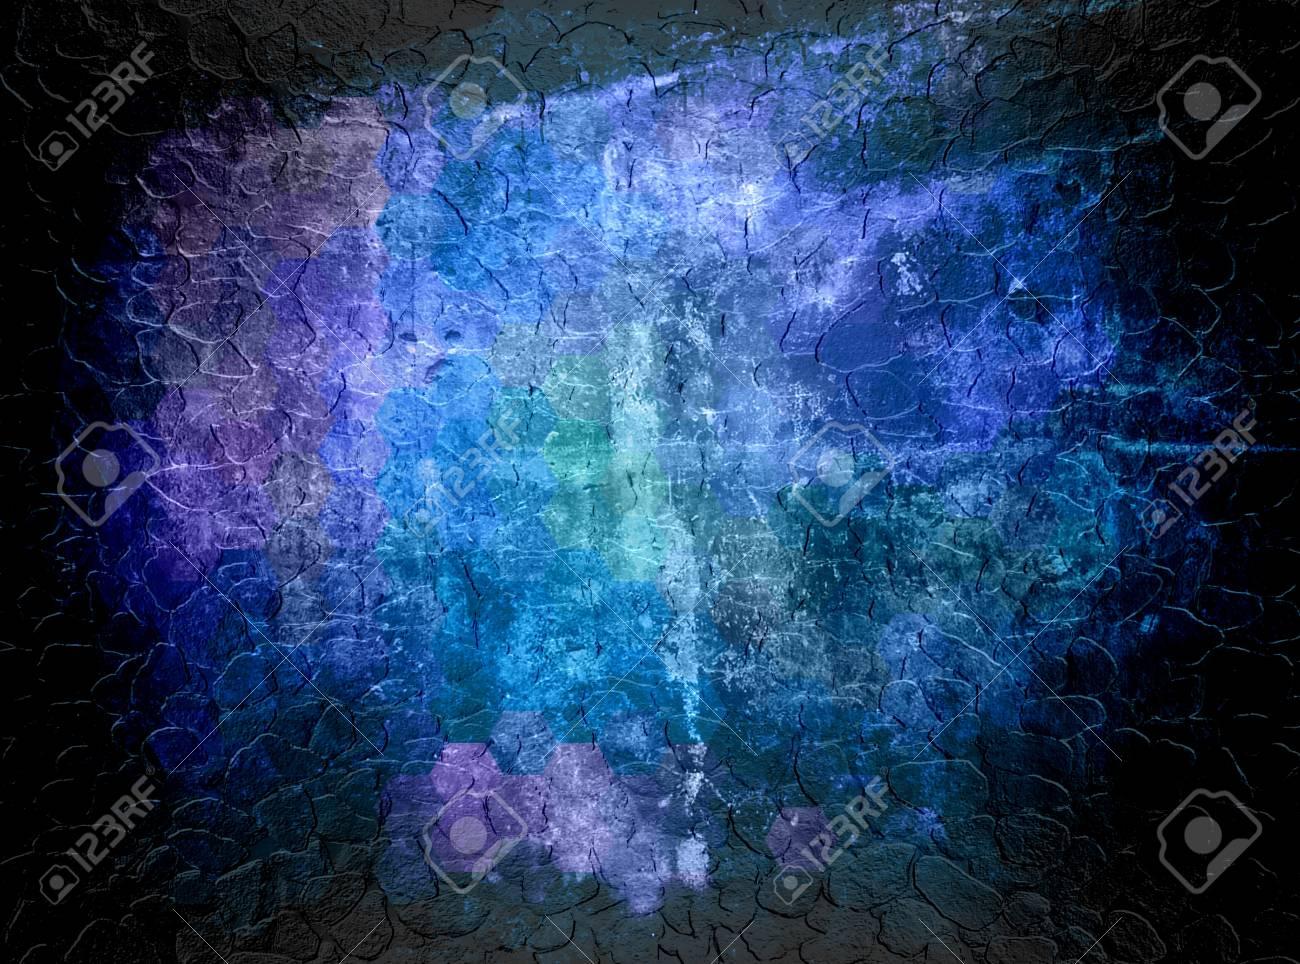 Dark Blue Abstract Art Backgrounds